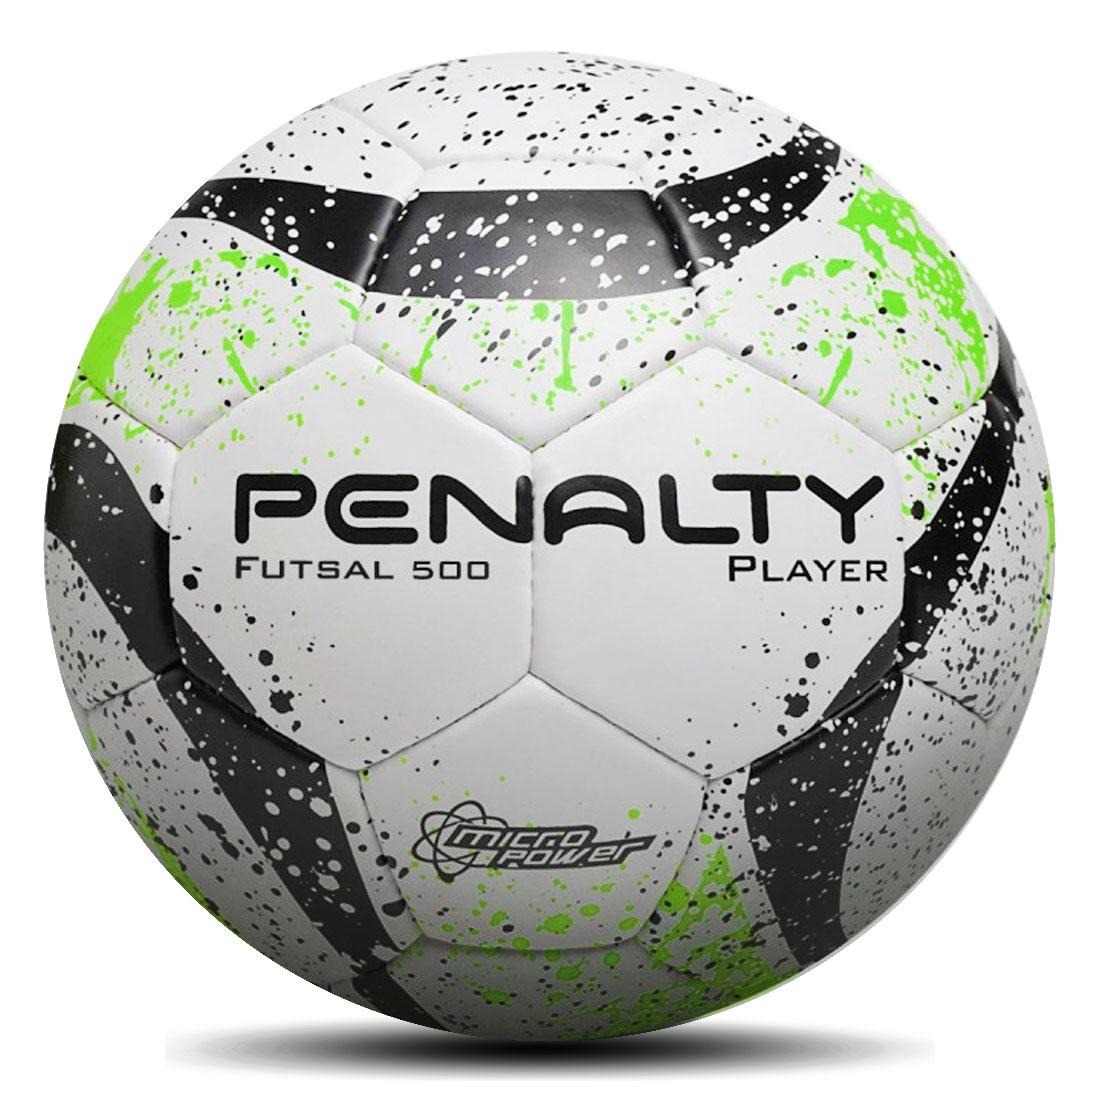 32176b0157f8a bola futsal penalty player 500 micro power. Carregando zoom.